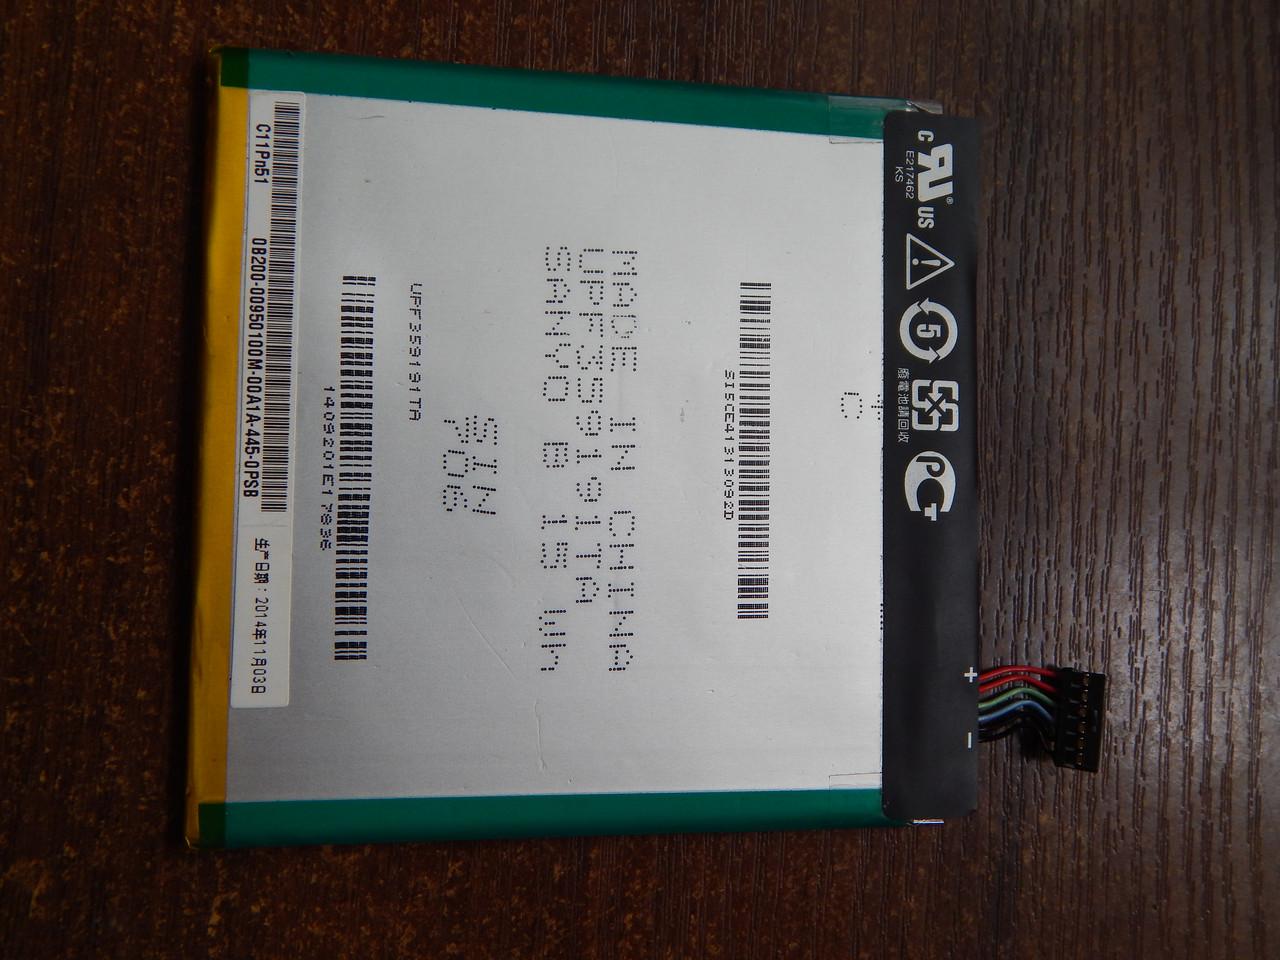 Аккумулятор, батарея Asus C11P1310 (ME372 FonePad 7 R00EB) 3950 mAh